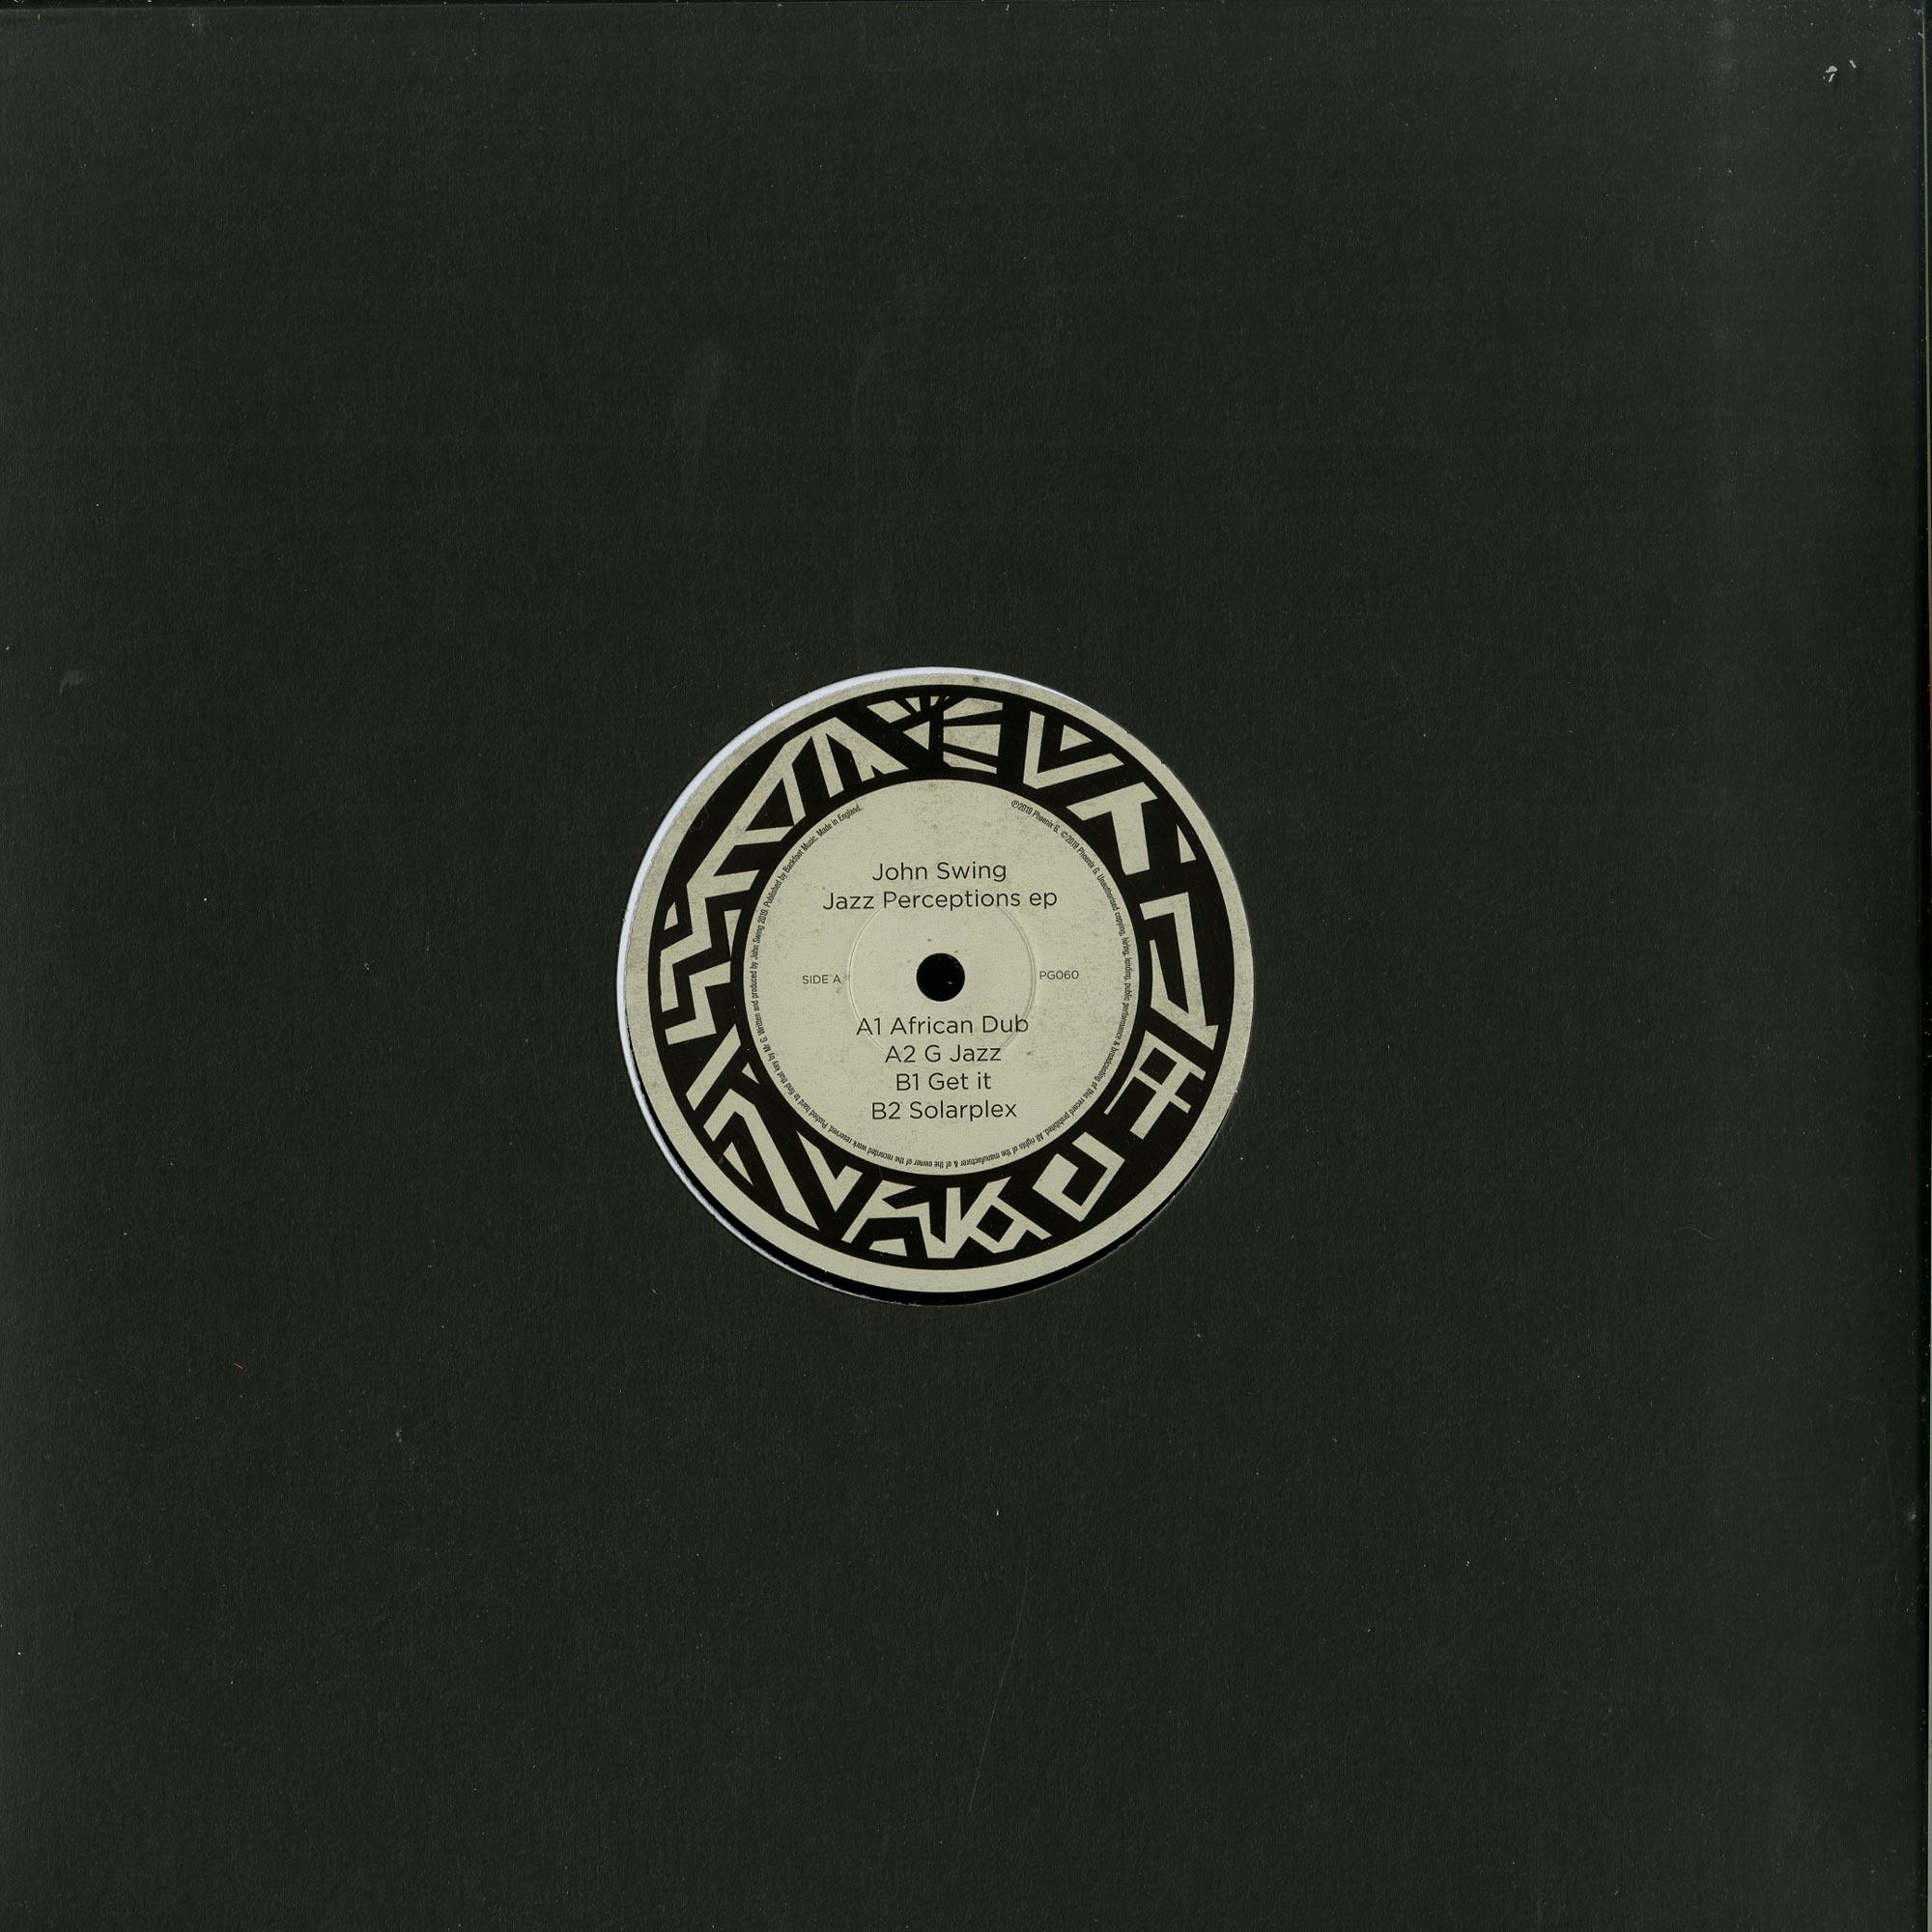 John Swing - JAZZ PERCEPTIONS EP